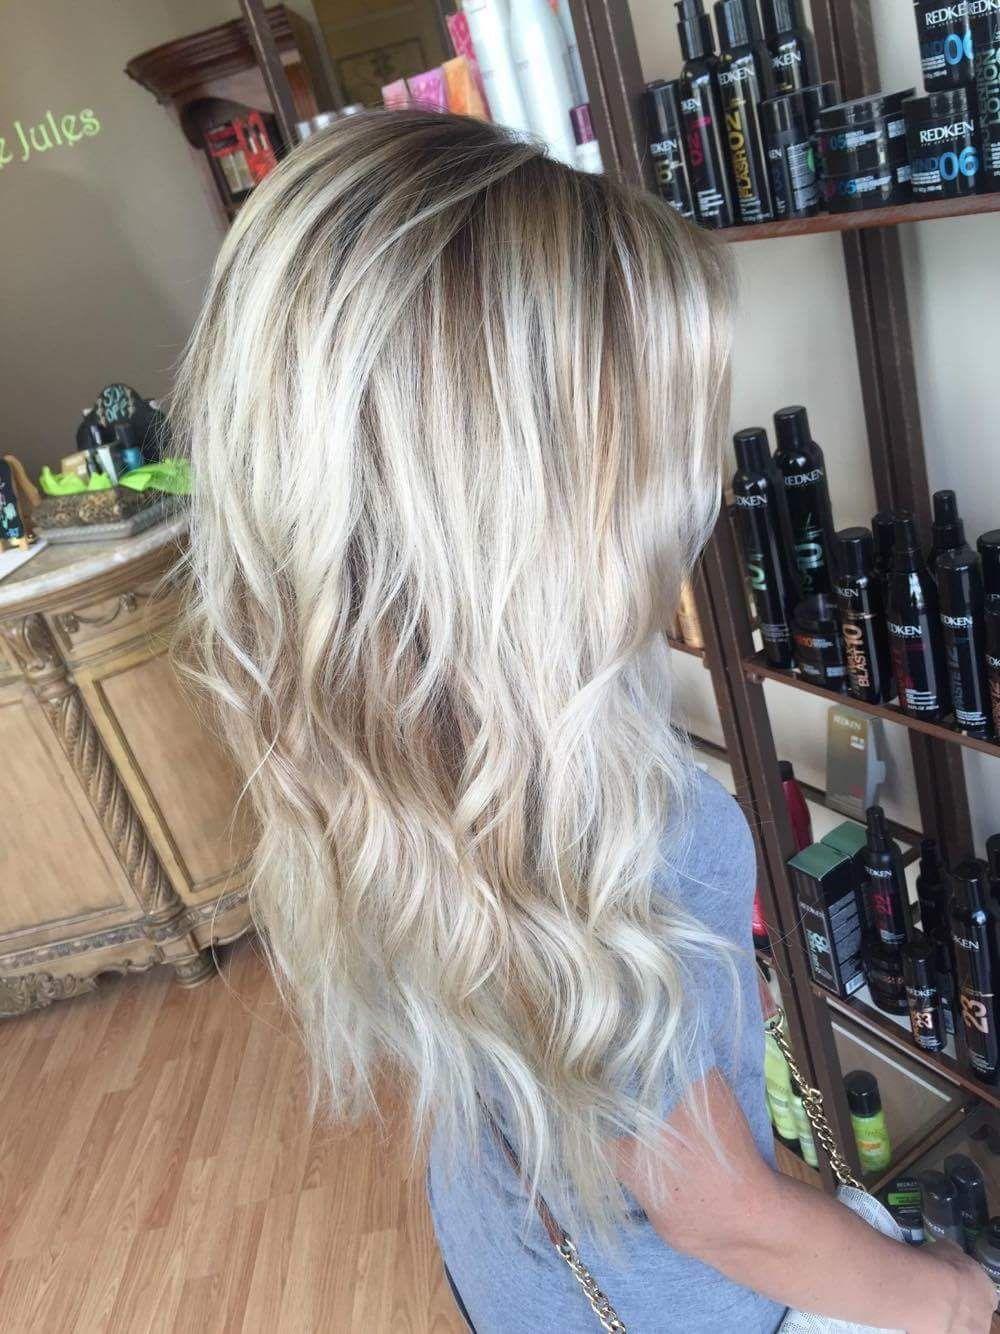 Blonde Ombre Blonde Shadow Root Rooted Blonde Platinum Blonde Summer Hair Blondie Blonde Hair With Roots Roots Hair Hair Shadow